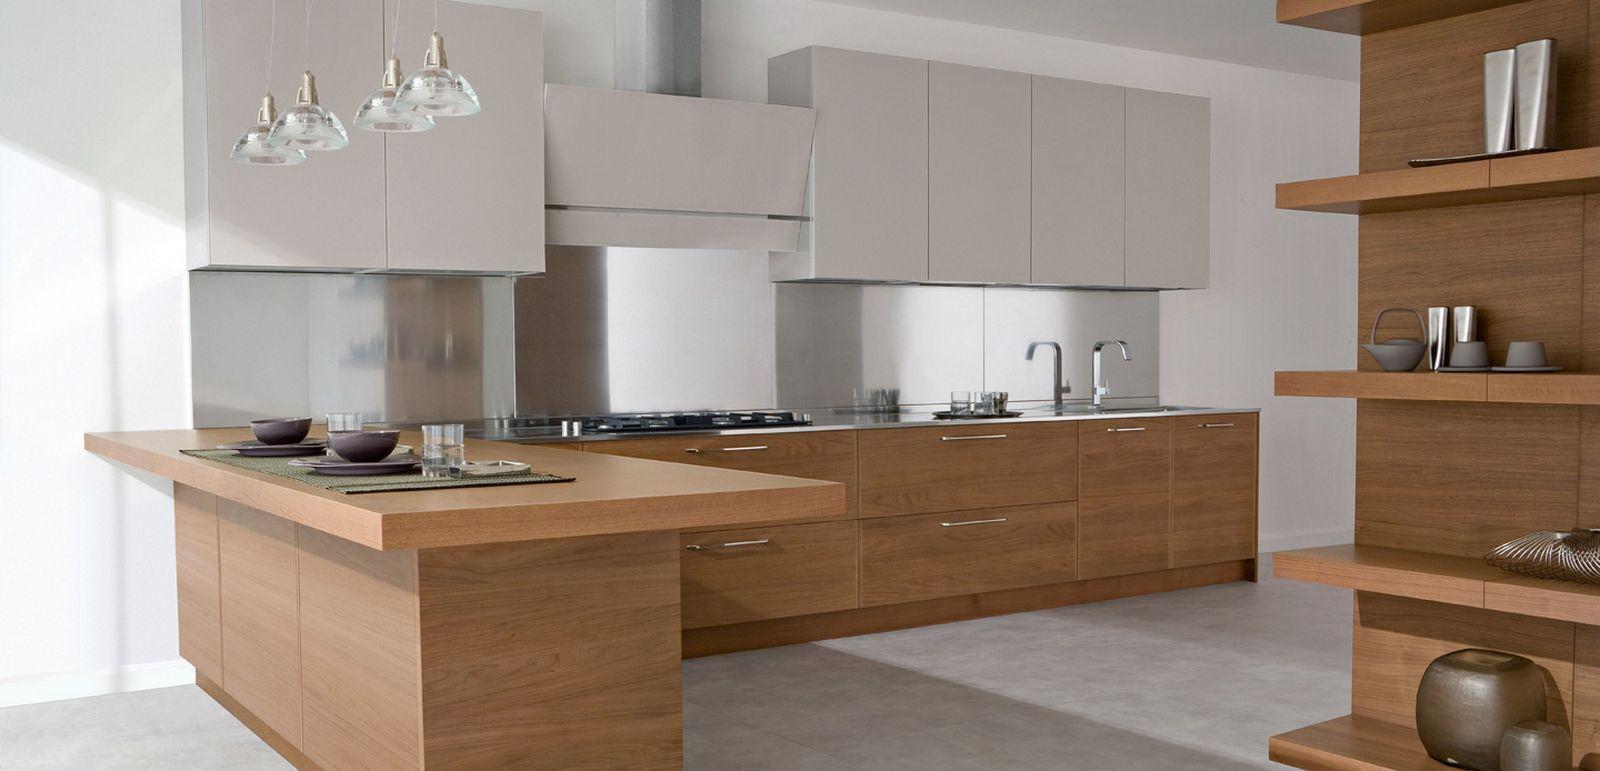 Lacquered Kitchen Design Ideas Home Design Dands Furniture Kitchen